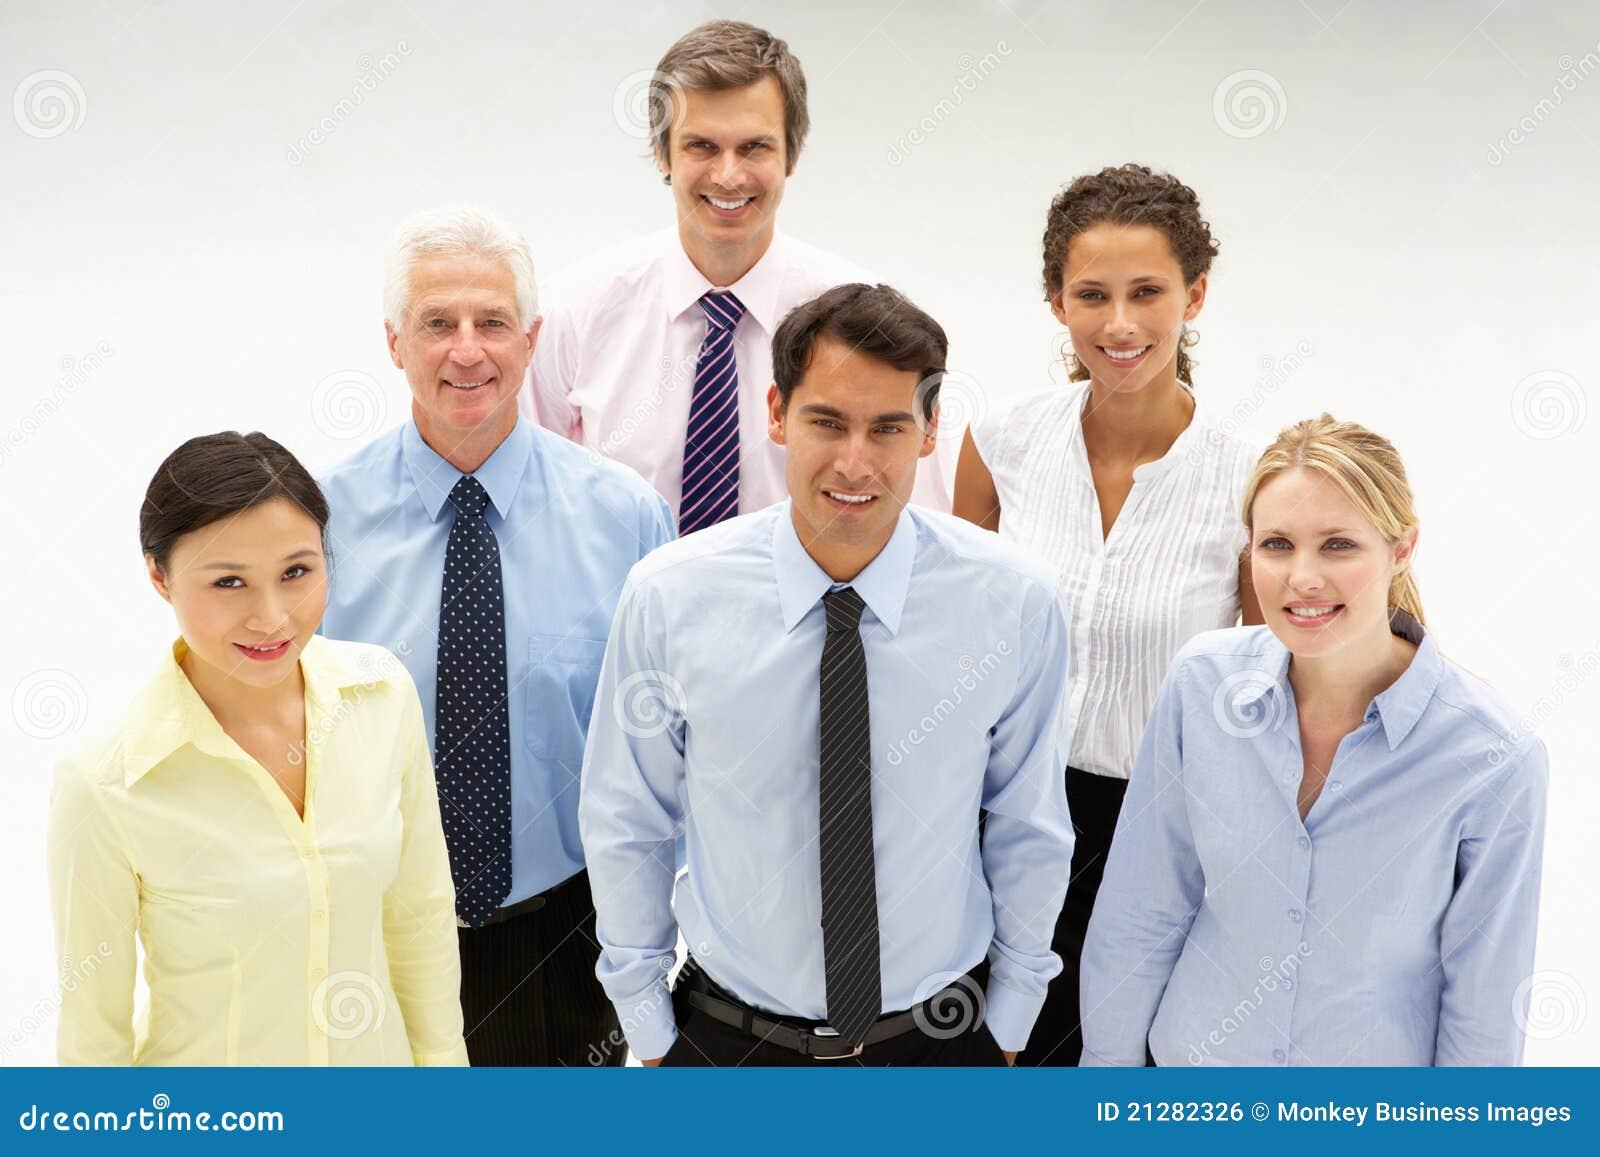 Grupo étnico mezclado de hombres de negocios